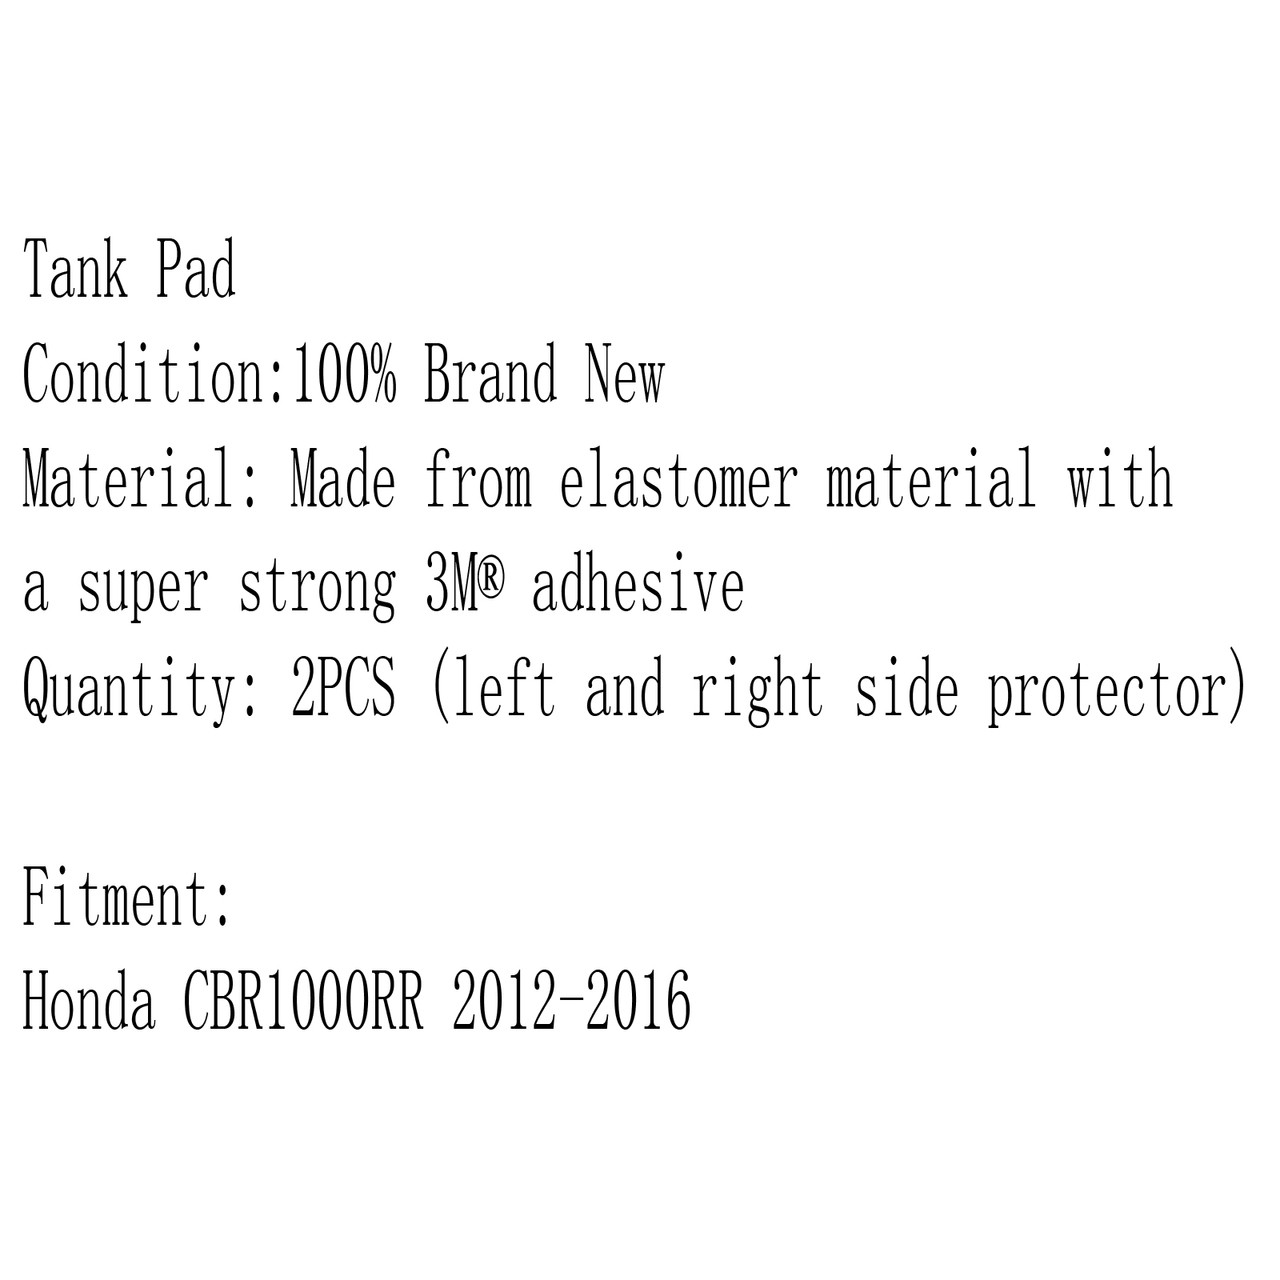 Tank Traction Pad Side Gas Knee Grip Protector 3M Honda CBR1000RR (2012-2016)